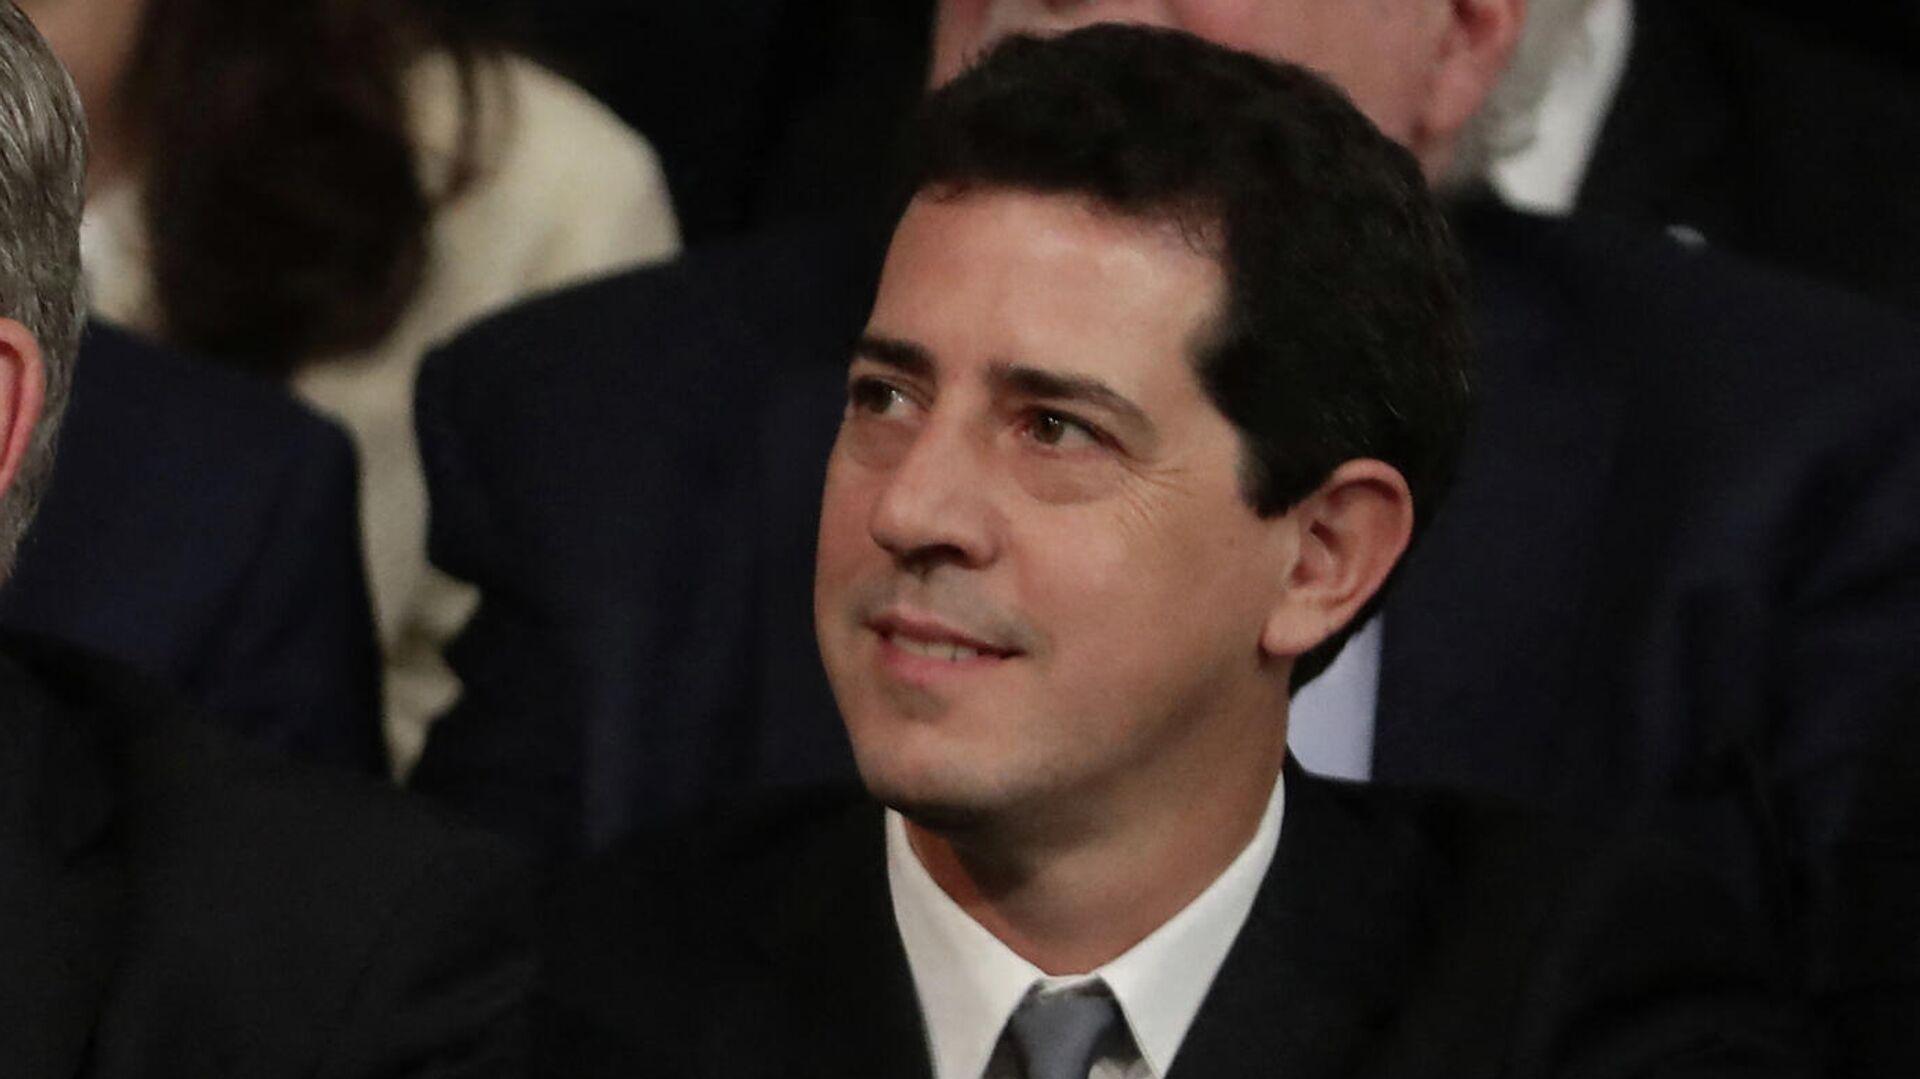 El ministro de Interior de Argentina, Wado de Pedro - Sputnik Mundo, 1920, 15.09.2021